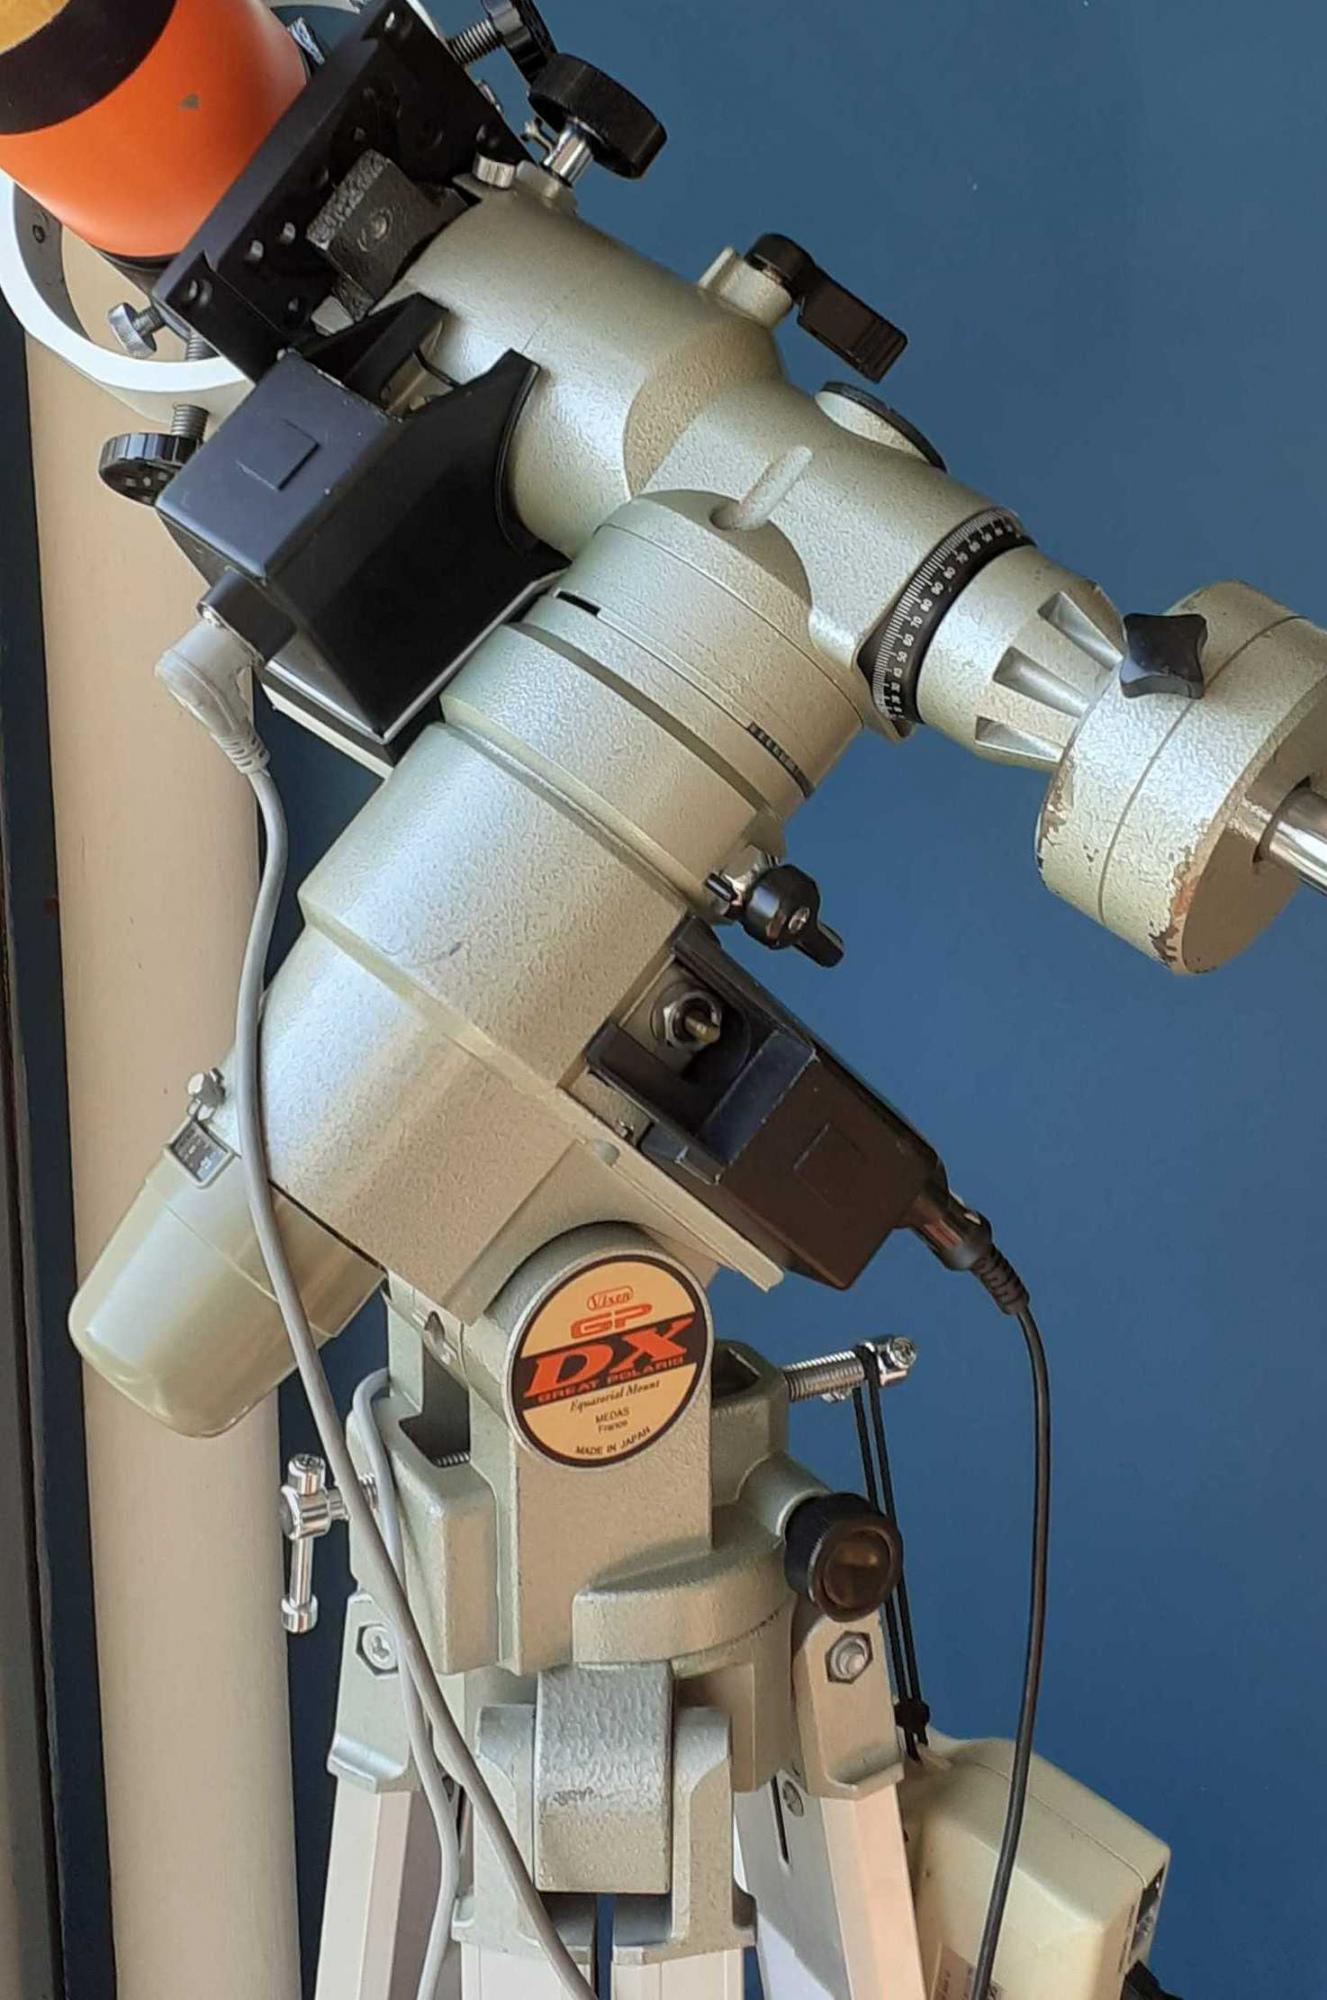 gpdxSkysensor.thumb.jpg.1954b950343c93e8493fc0957d80746d.jpg